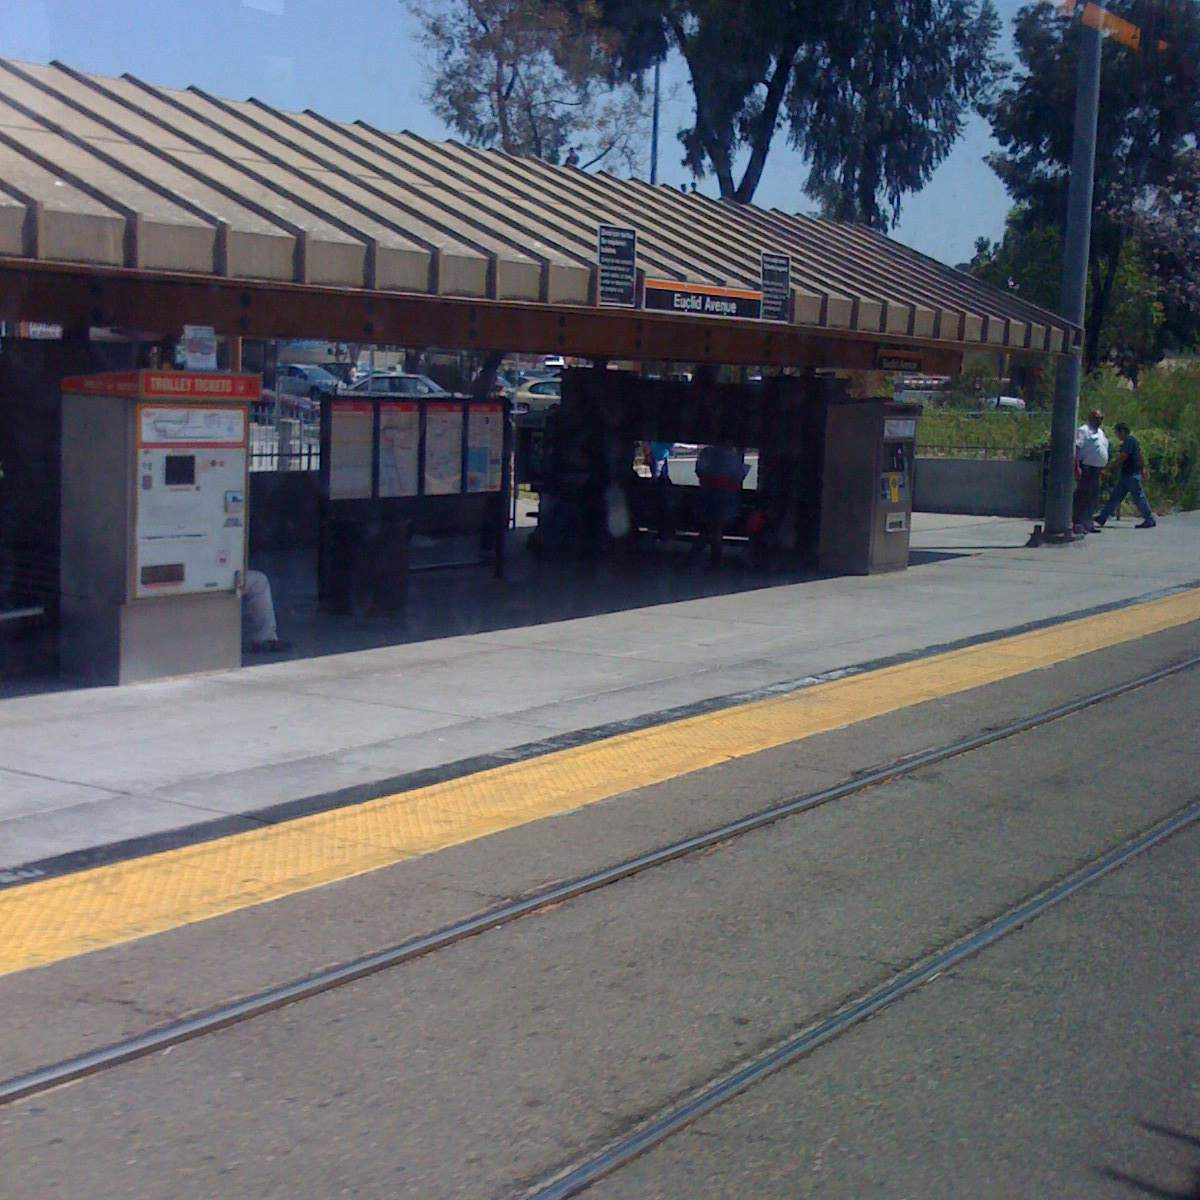 Euclid Avenue Station